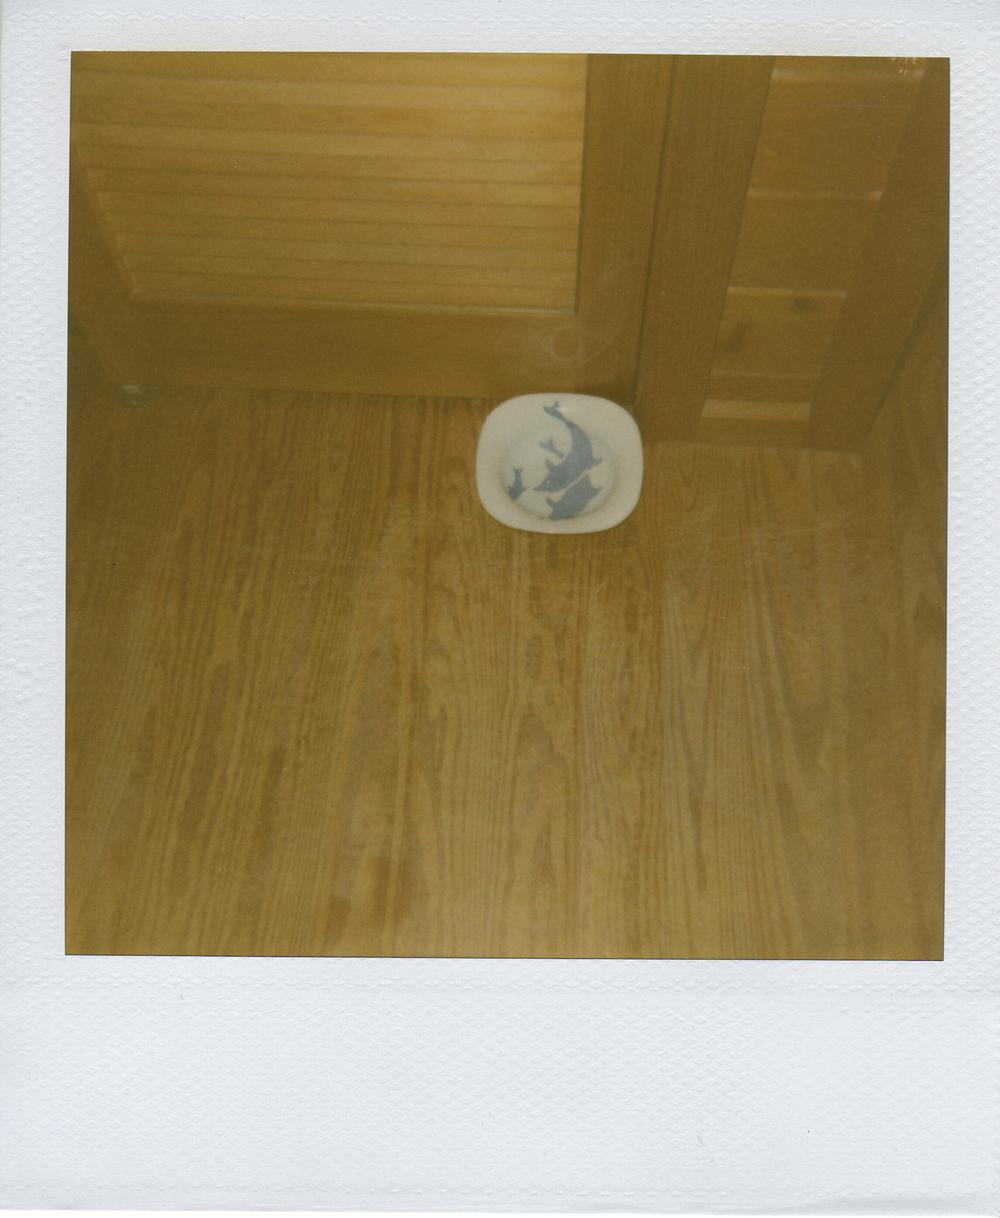 jlaurence-polaroid-114.jpg